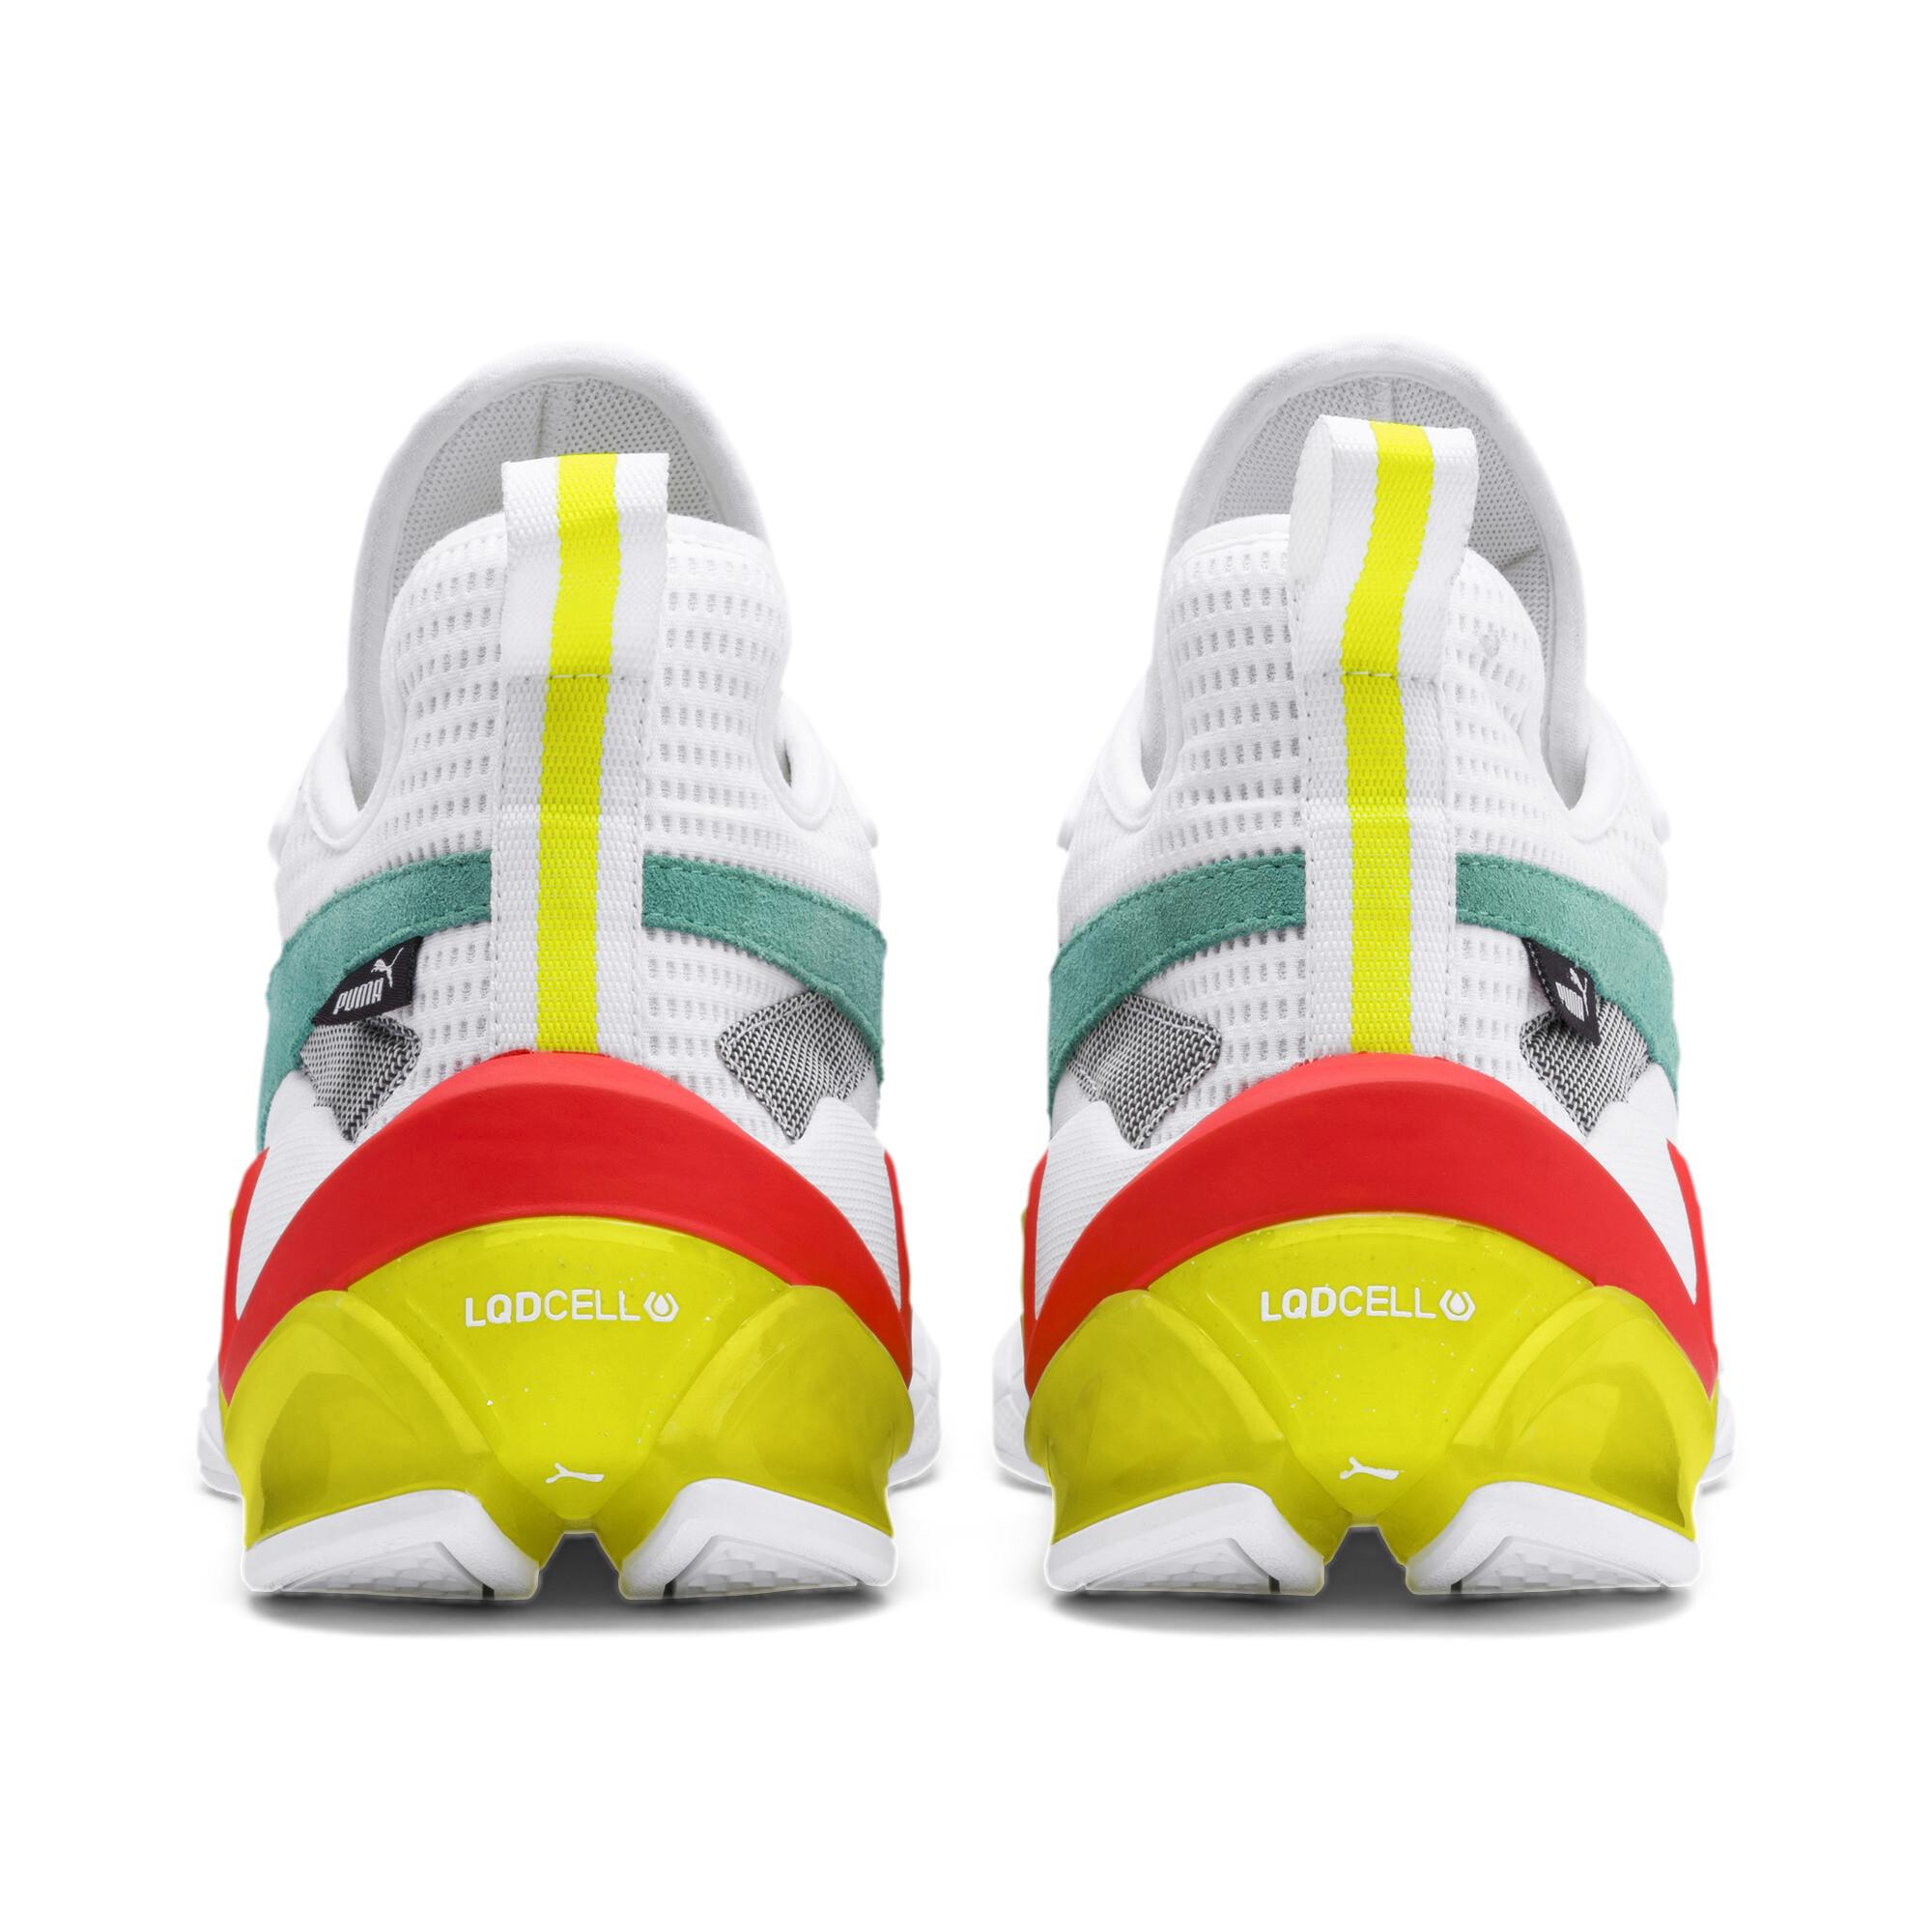 PUMA-Men-039-s-LQDCELL-Origin-Training-Shoes thumbnail 5